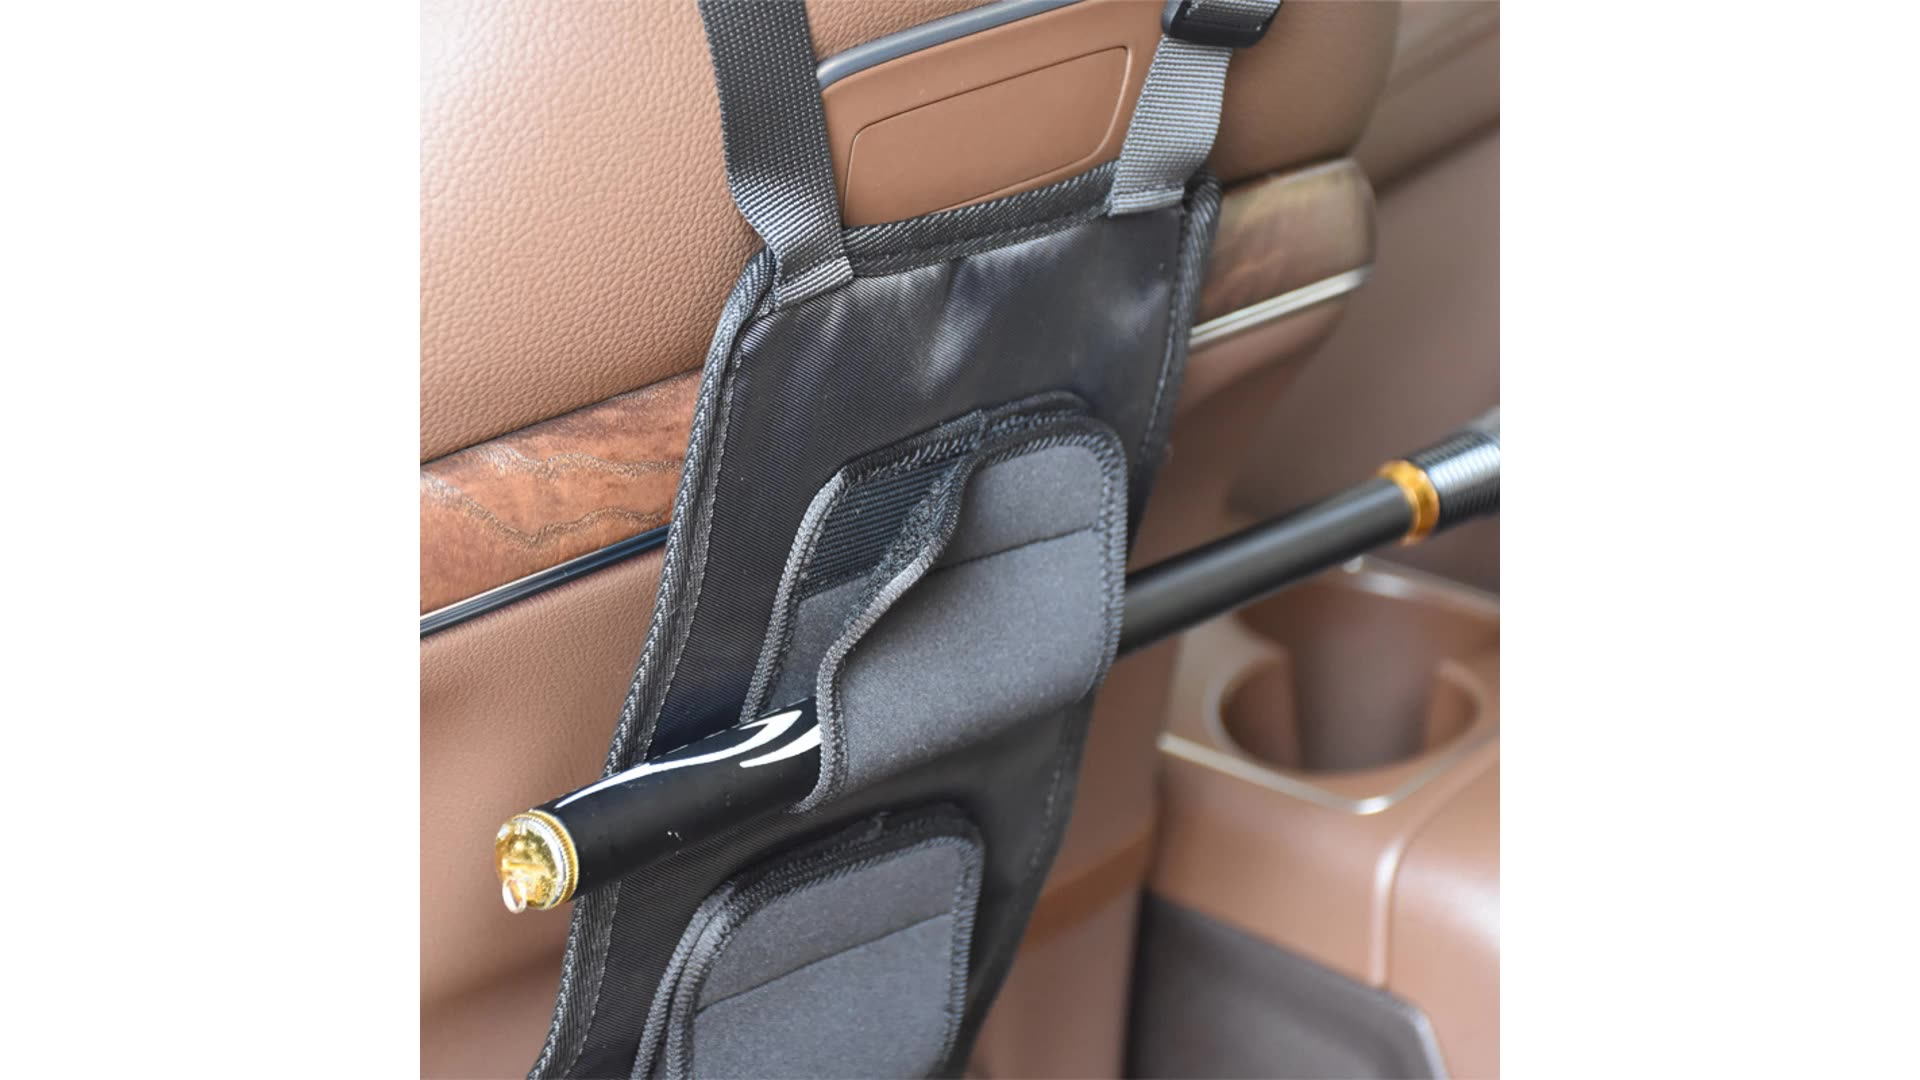 MultiFunction Back Seat Car Vehicle Fishing Rod Holder Bag 2pcs With Elastic Band And Adjustable Strap